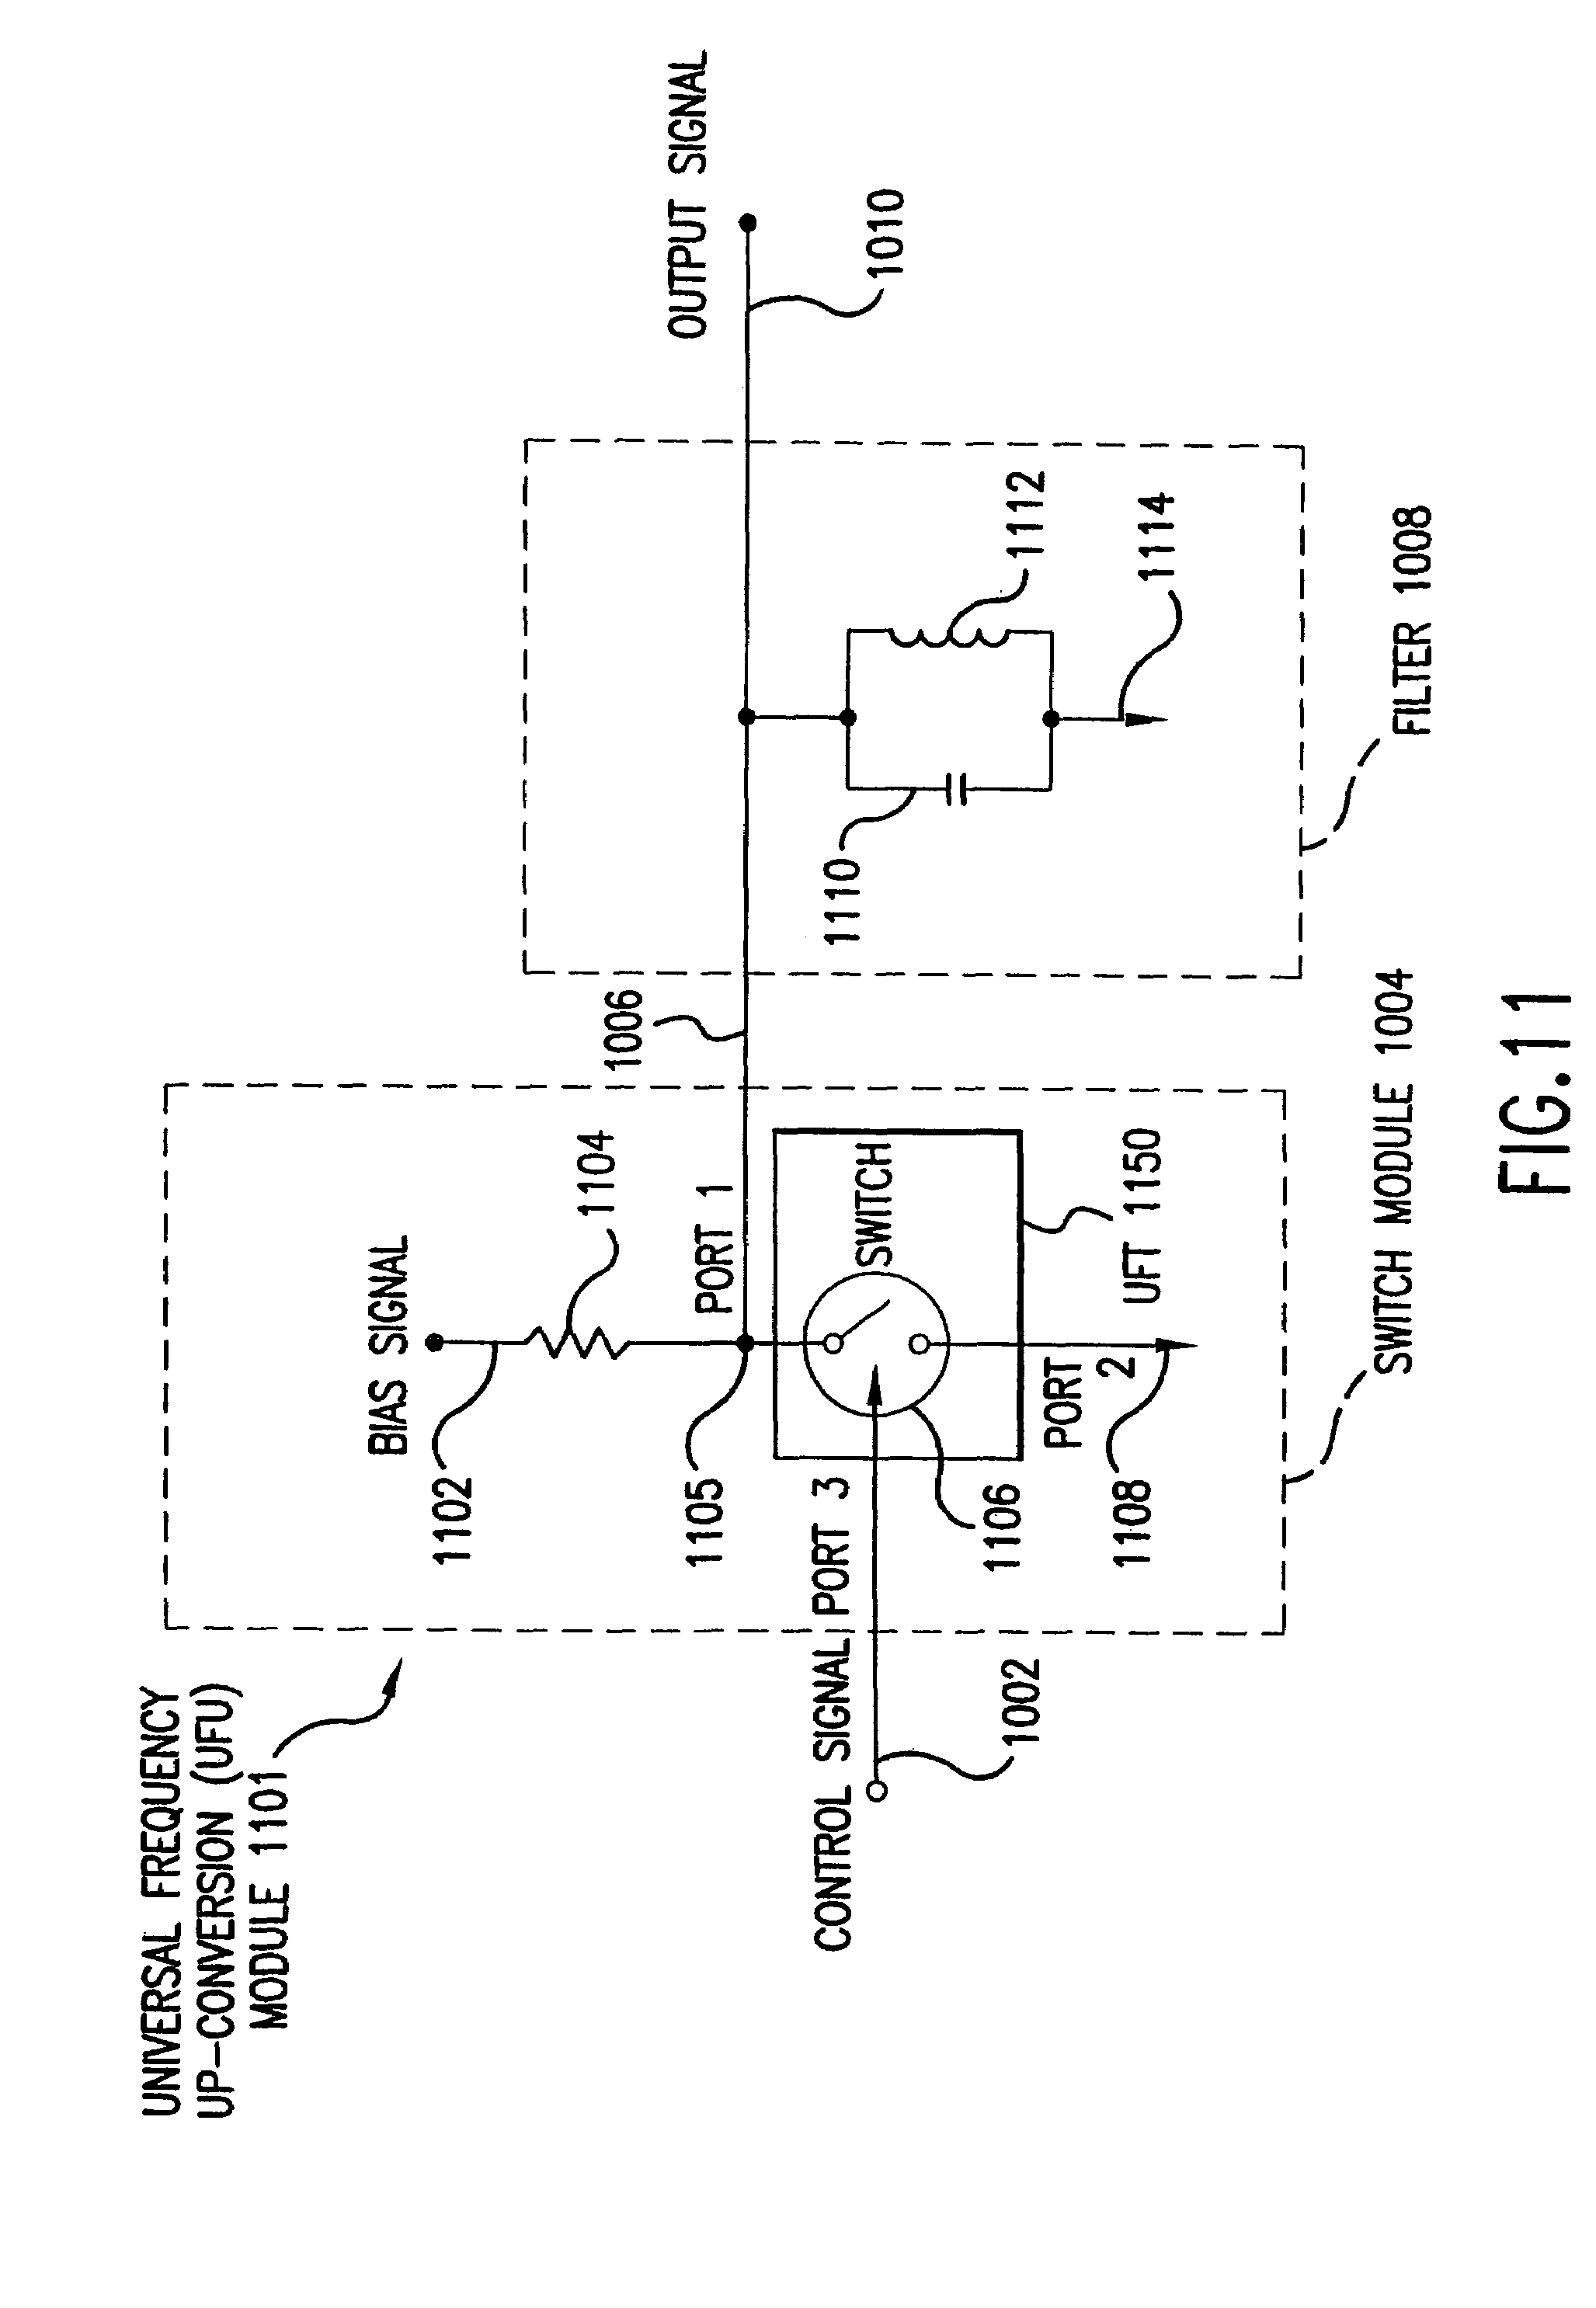 Patent US 7,496,342 B2